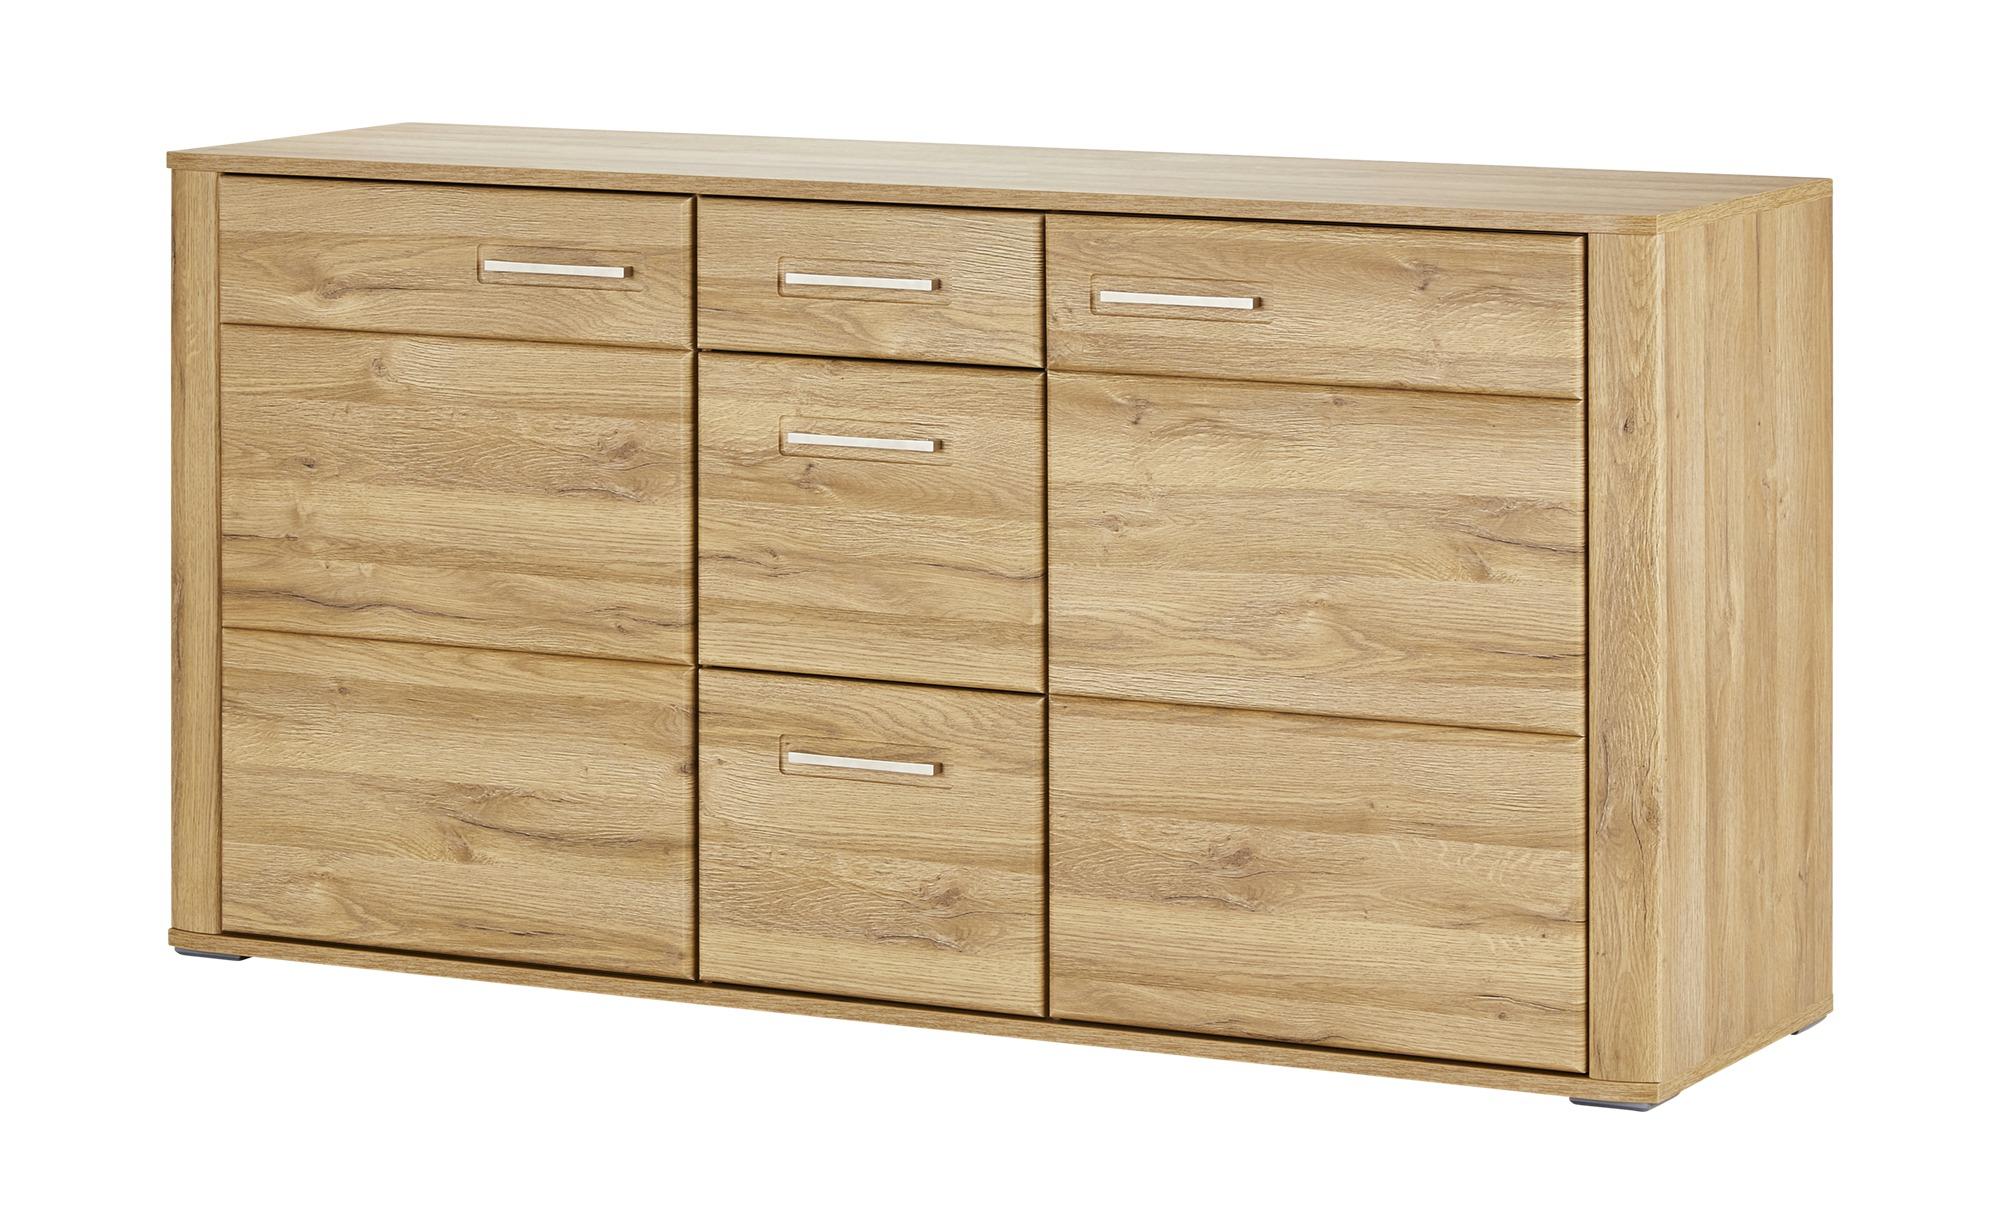 uno Sideboard  Lasal ¦ holzfarben ¦ Maße (cm): B: 162 H: 83 T: 47 Kommoden & Sideboards > Sideboards - Höffner